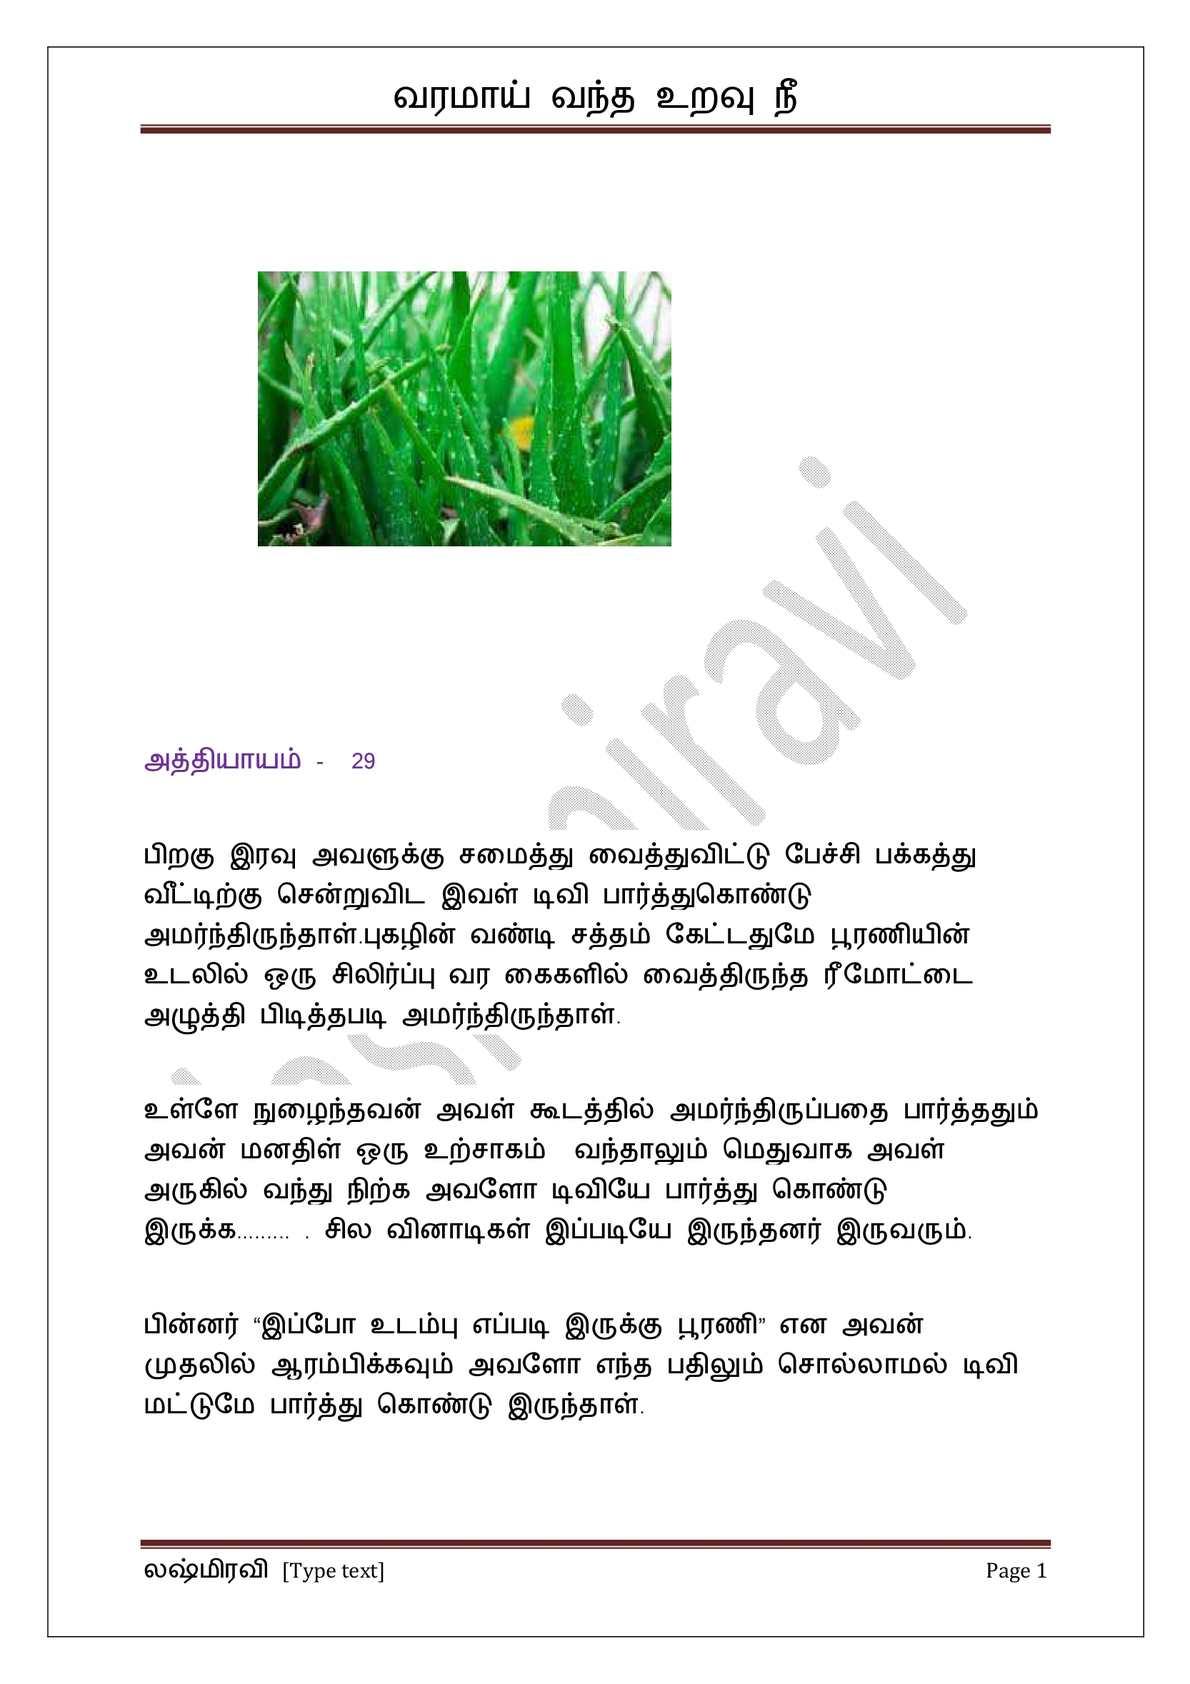 Varamaai Vantha Uravu Nee 29